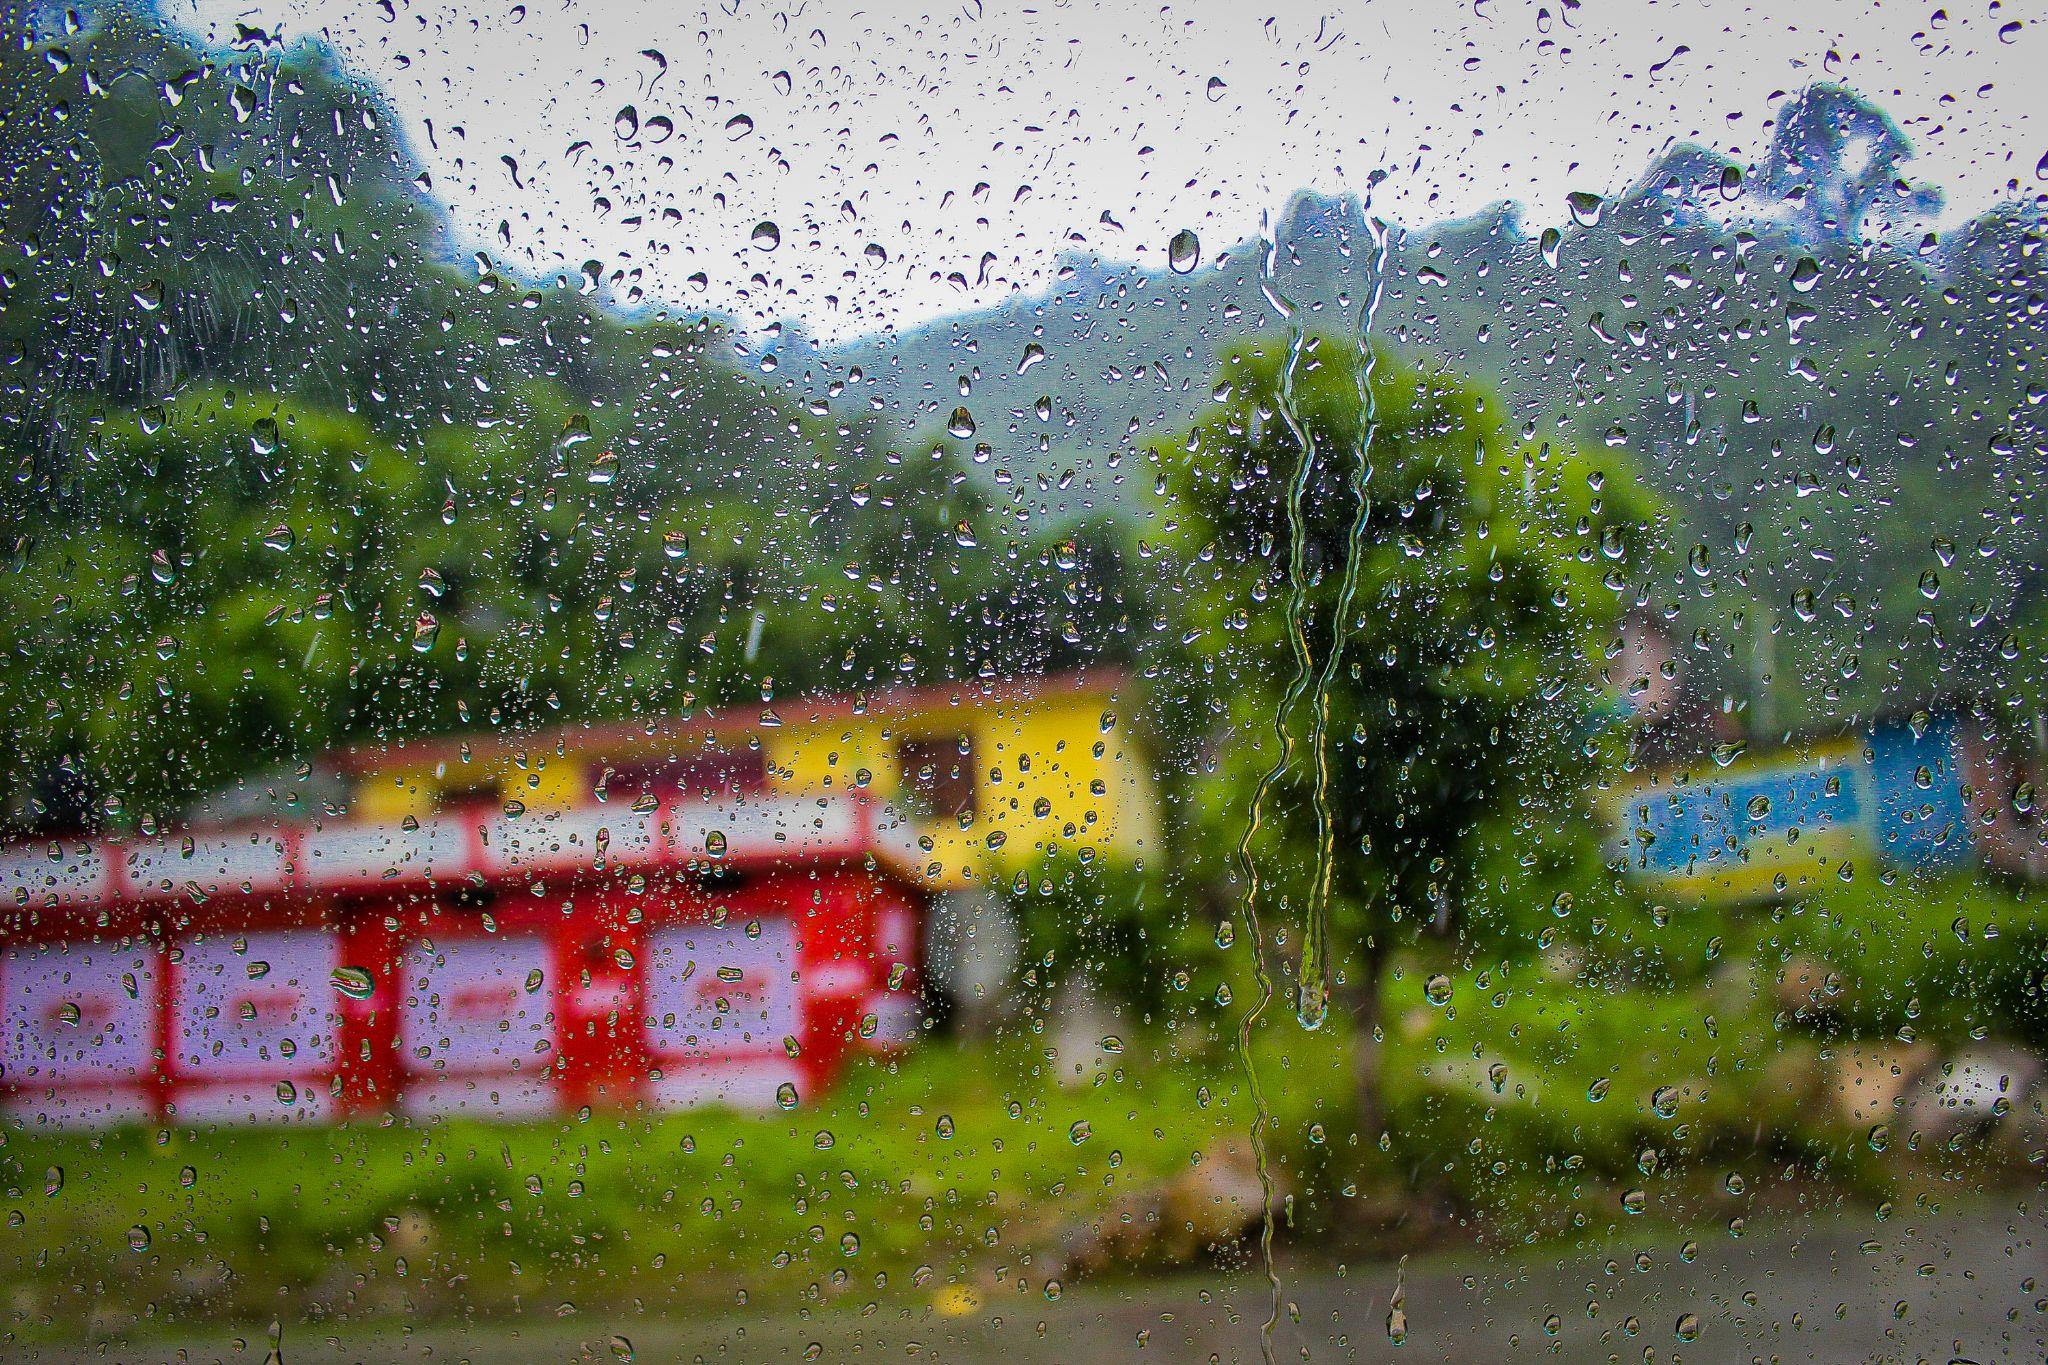 Stopover to enjoy Rain  by sunil.purushothaman